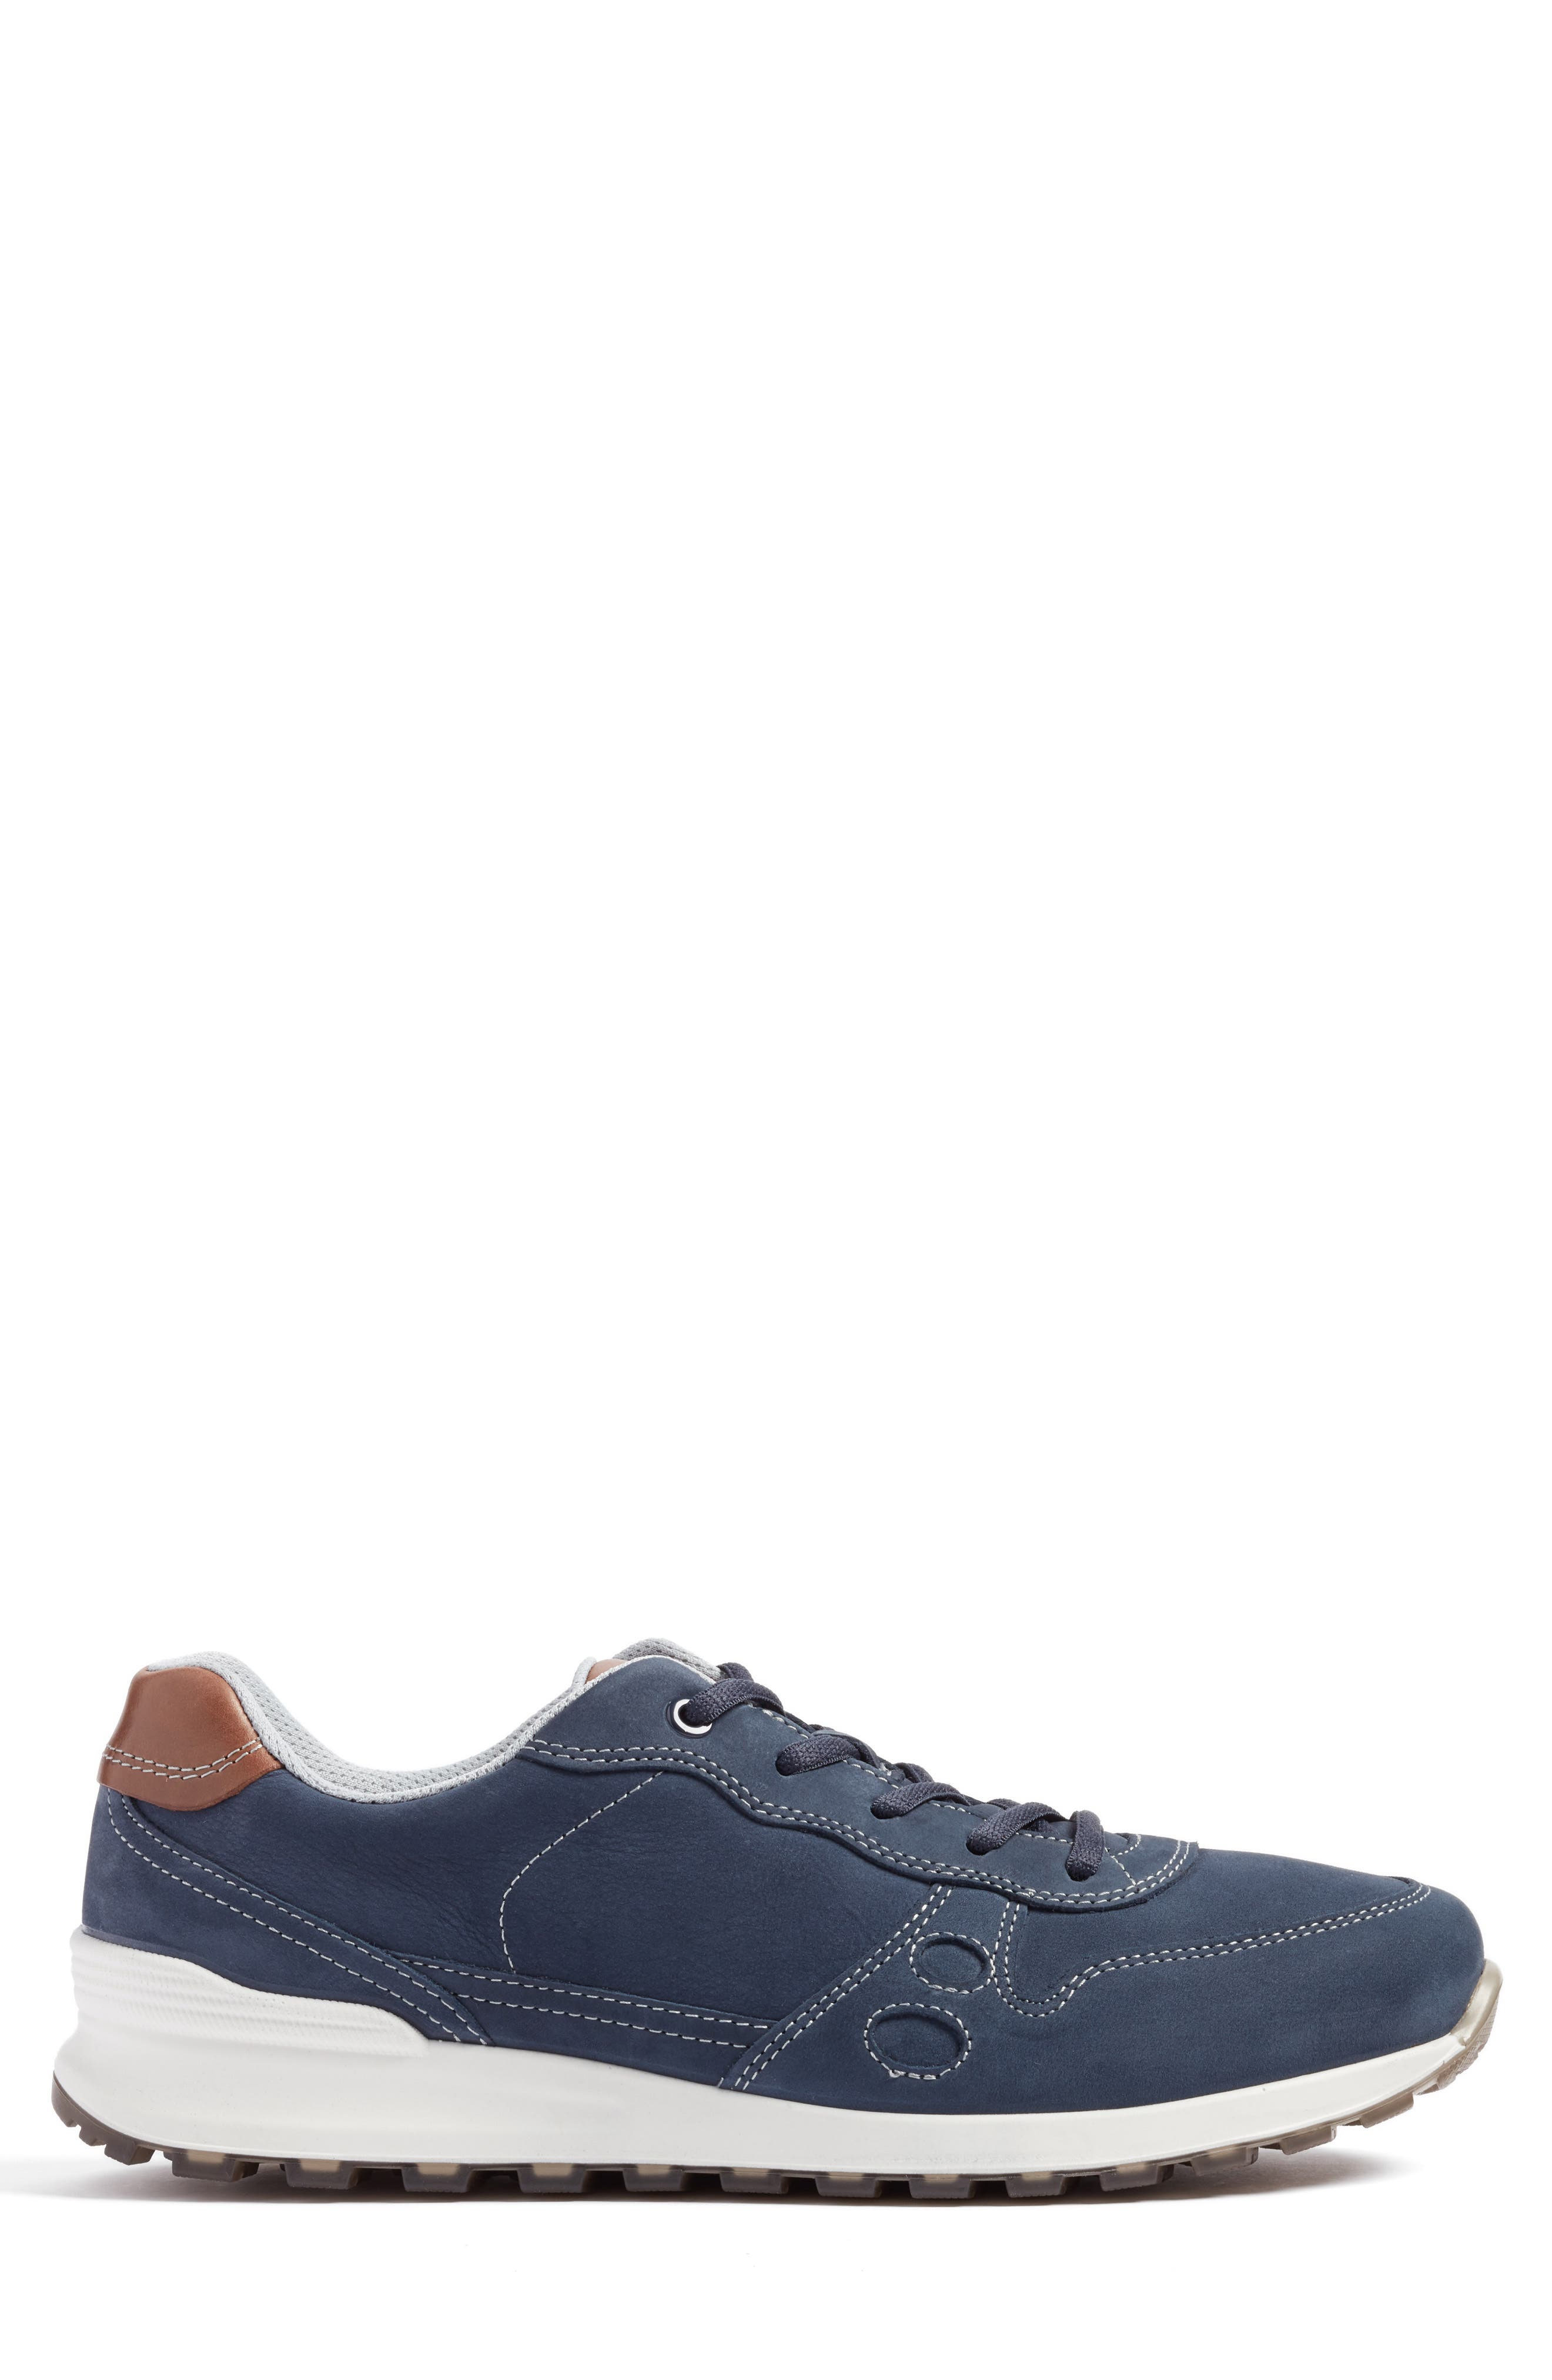 CS14 Retro Sneaker,                             Alternate thumbnail 3, color,                             408